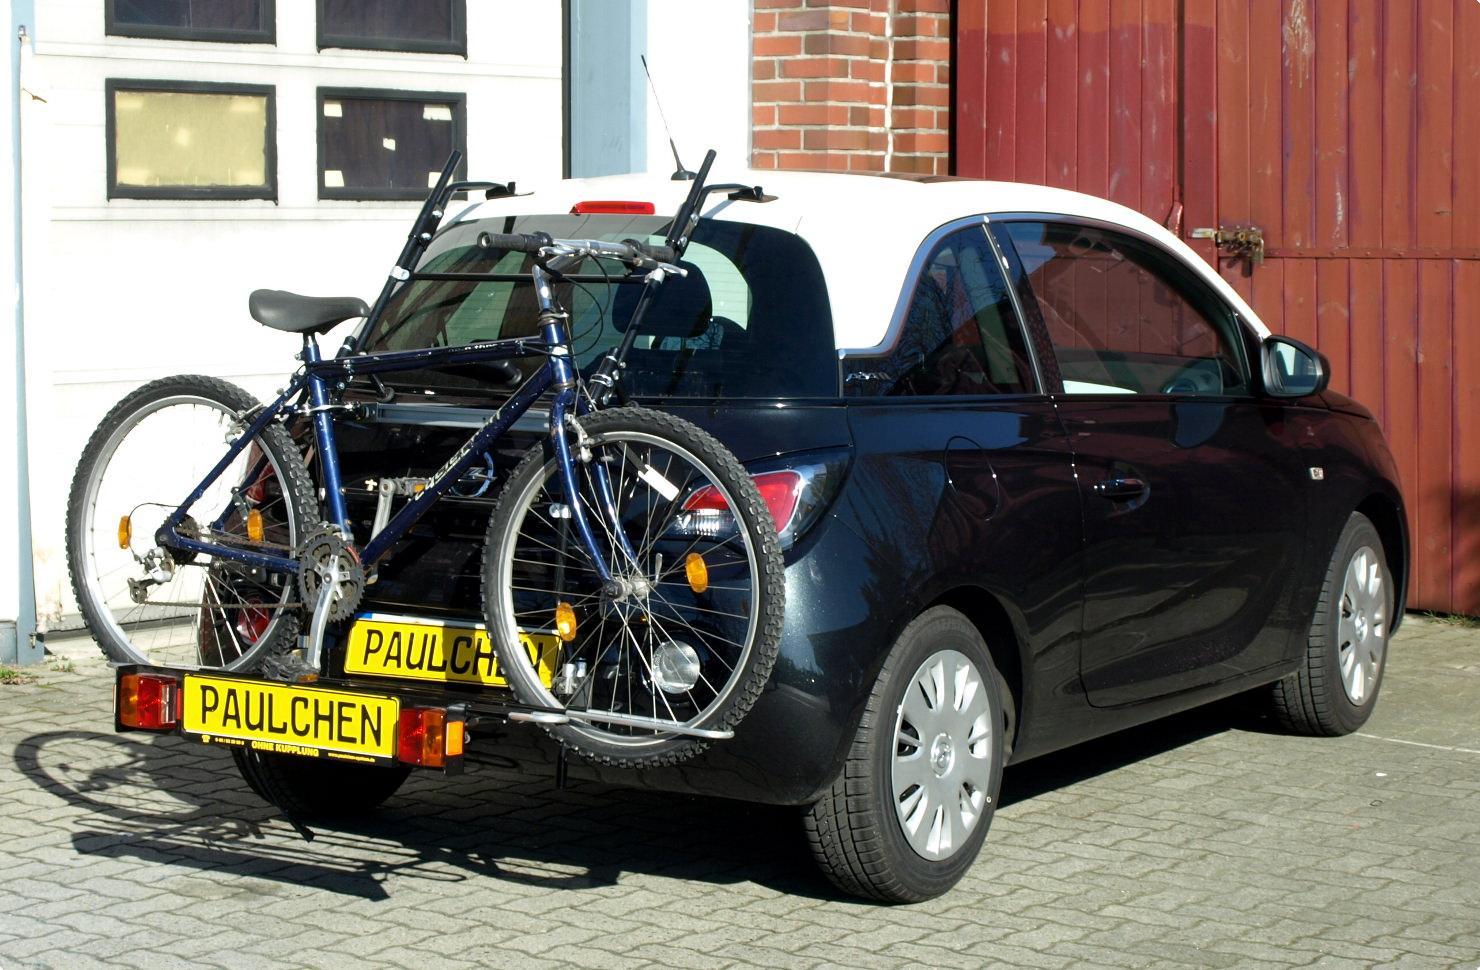 opel adam fahrradträger am heck - paulchen heckträger system